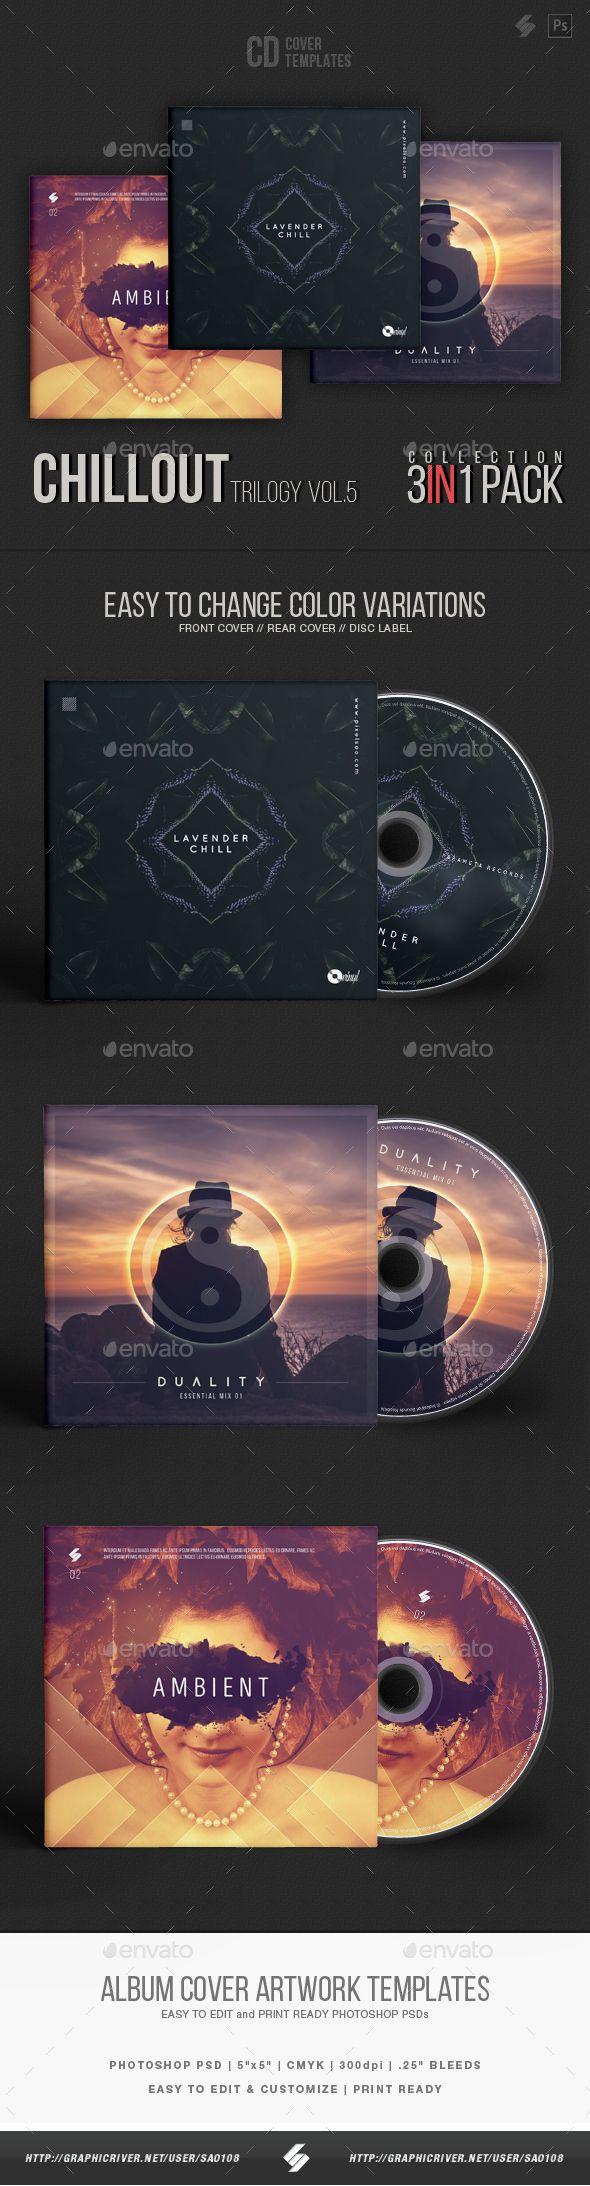 Chillout Trilogy vol.5 - CD Cover Templates Bundle - #CD & DVD Artwork Print Templates